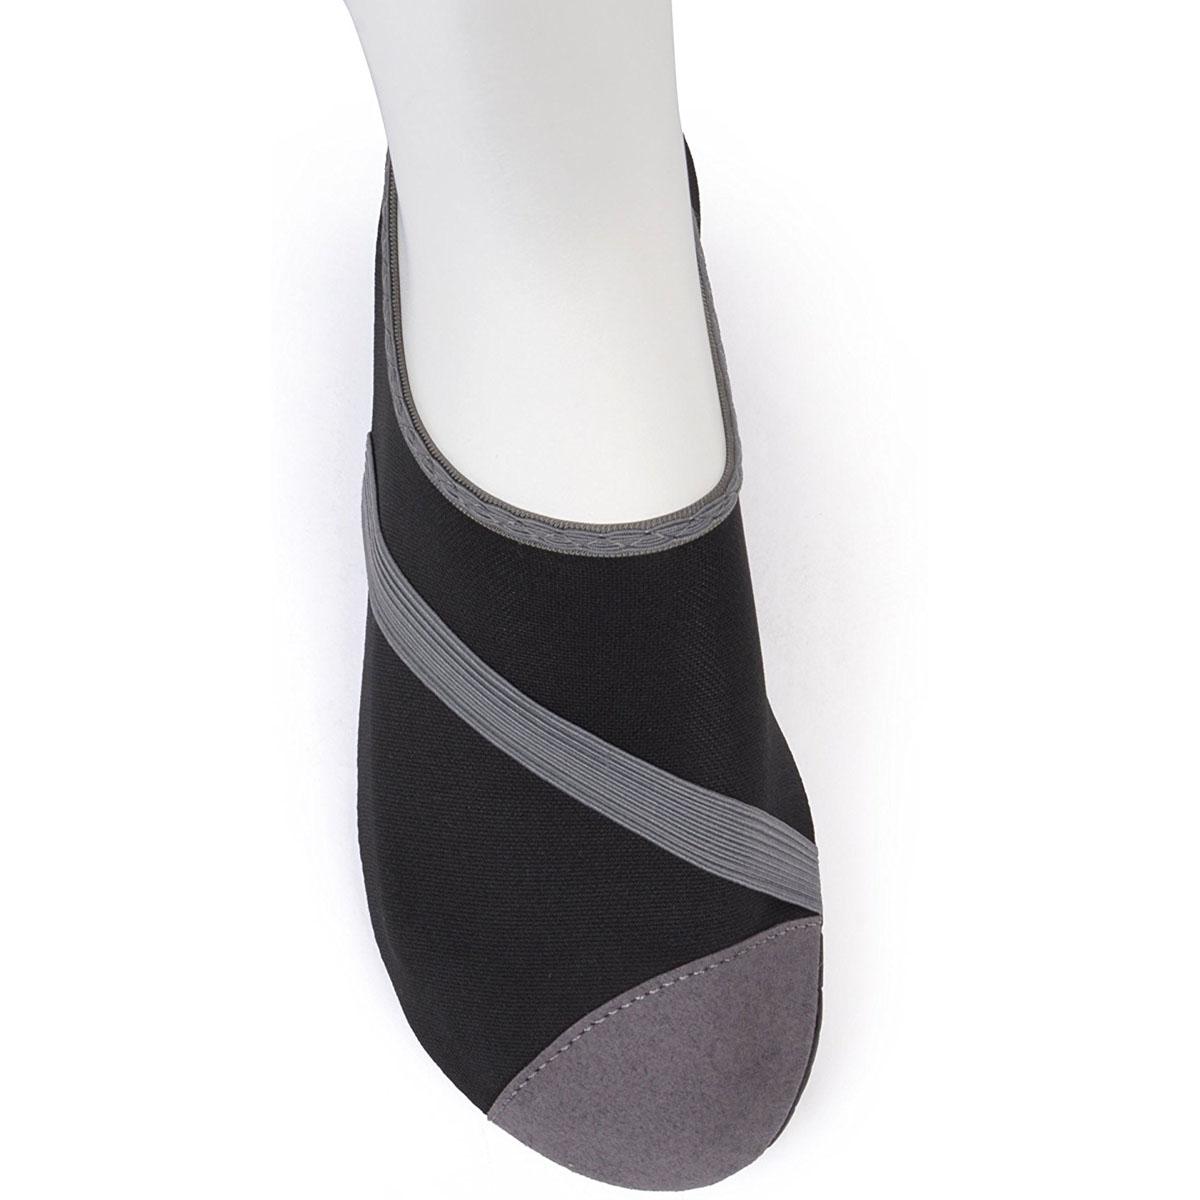 FitKicks-Women-039-s-Non-Slip-Sole-Active-Footwear thumbnail 8